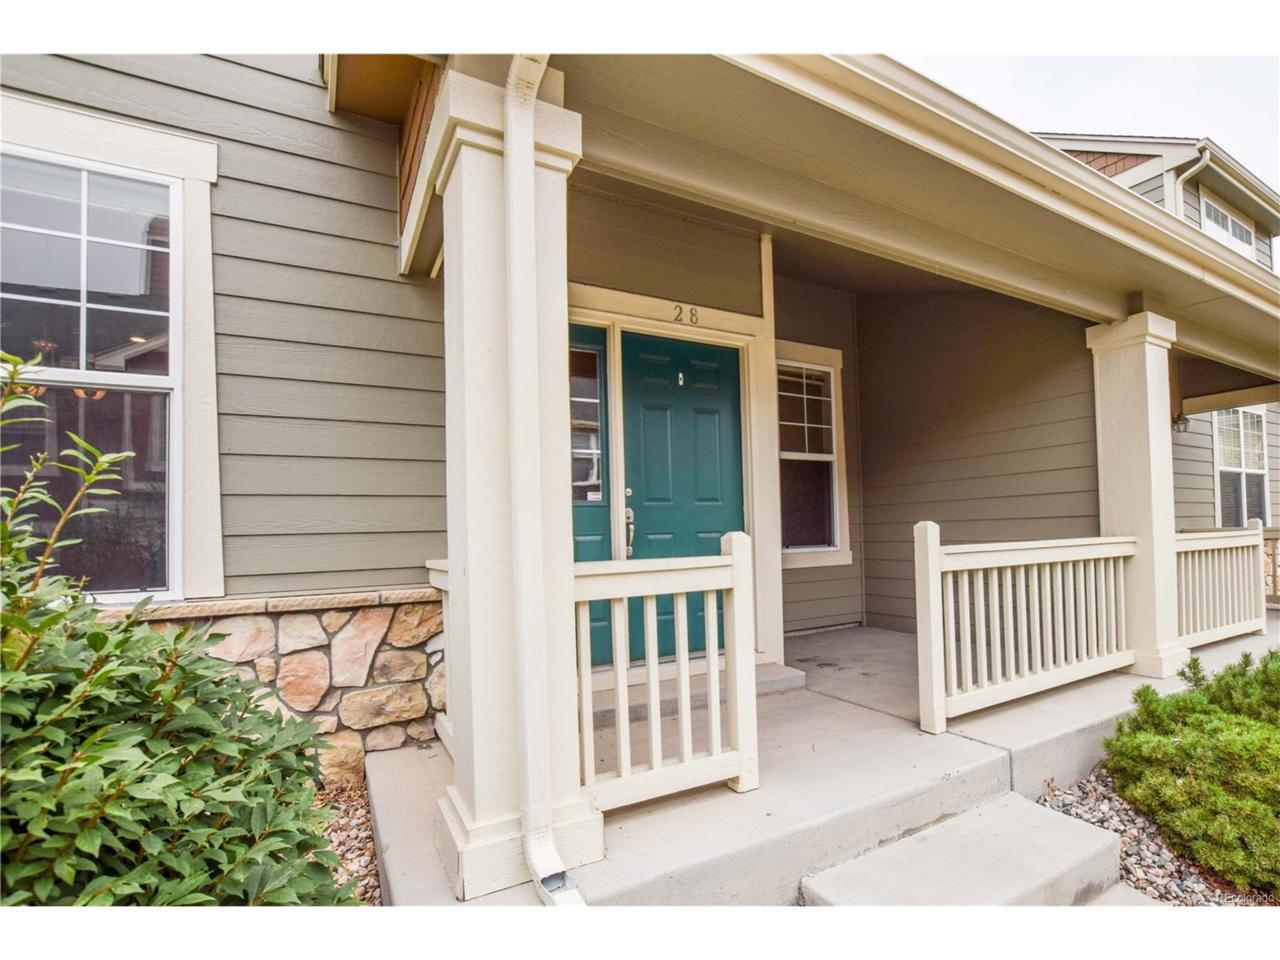 6806 W 3rd Street #28, Greeley, CO 80634 (MLS #2325114) :: 8z Real Estate